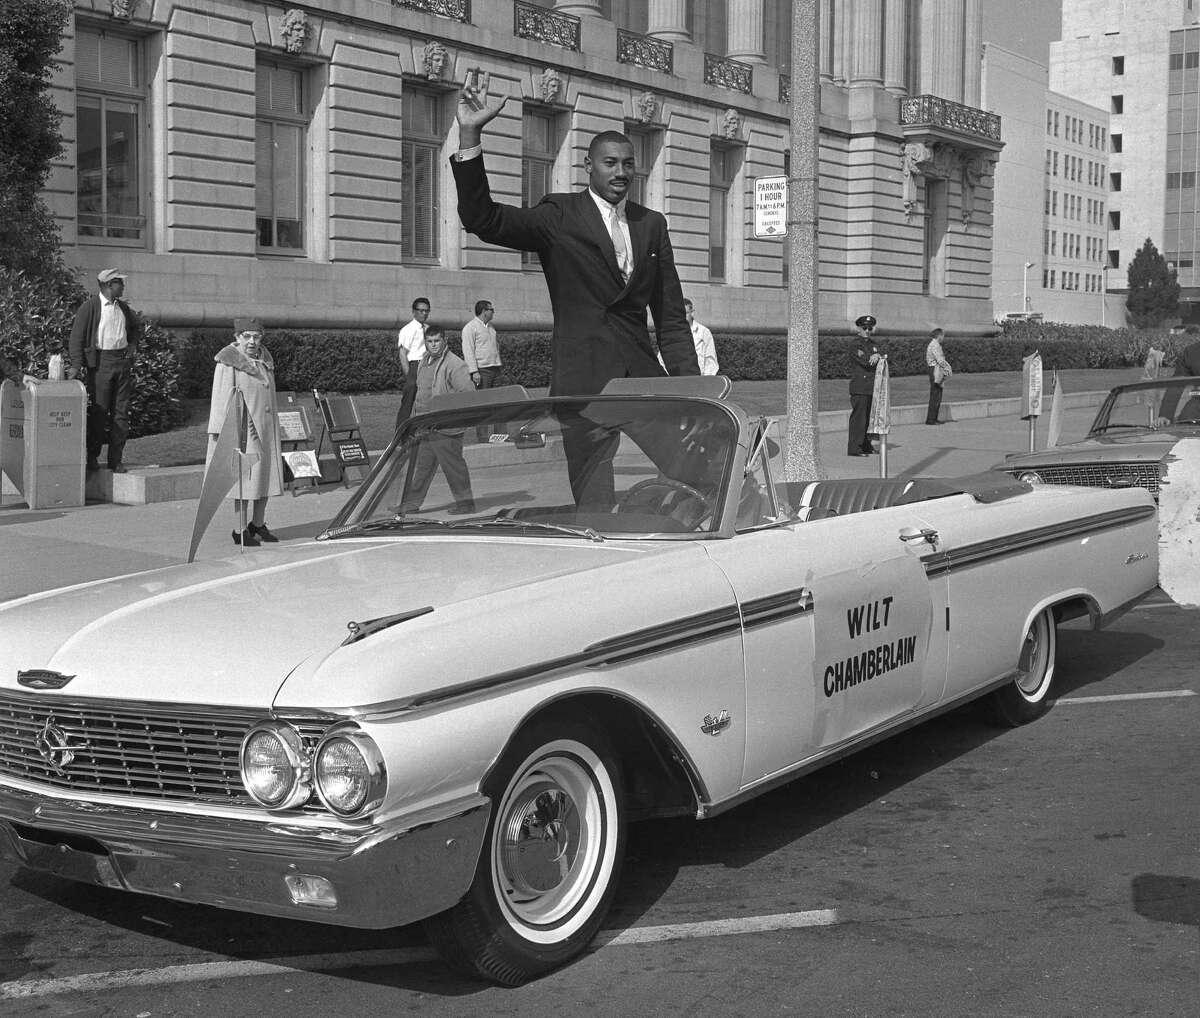 San Francisco Warriors at City Hall in San Francisco Wilt Chamberlain Staff shot, but photographer unidentified